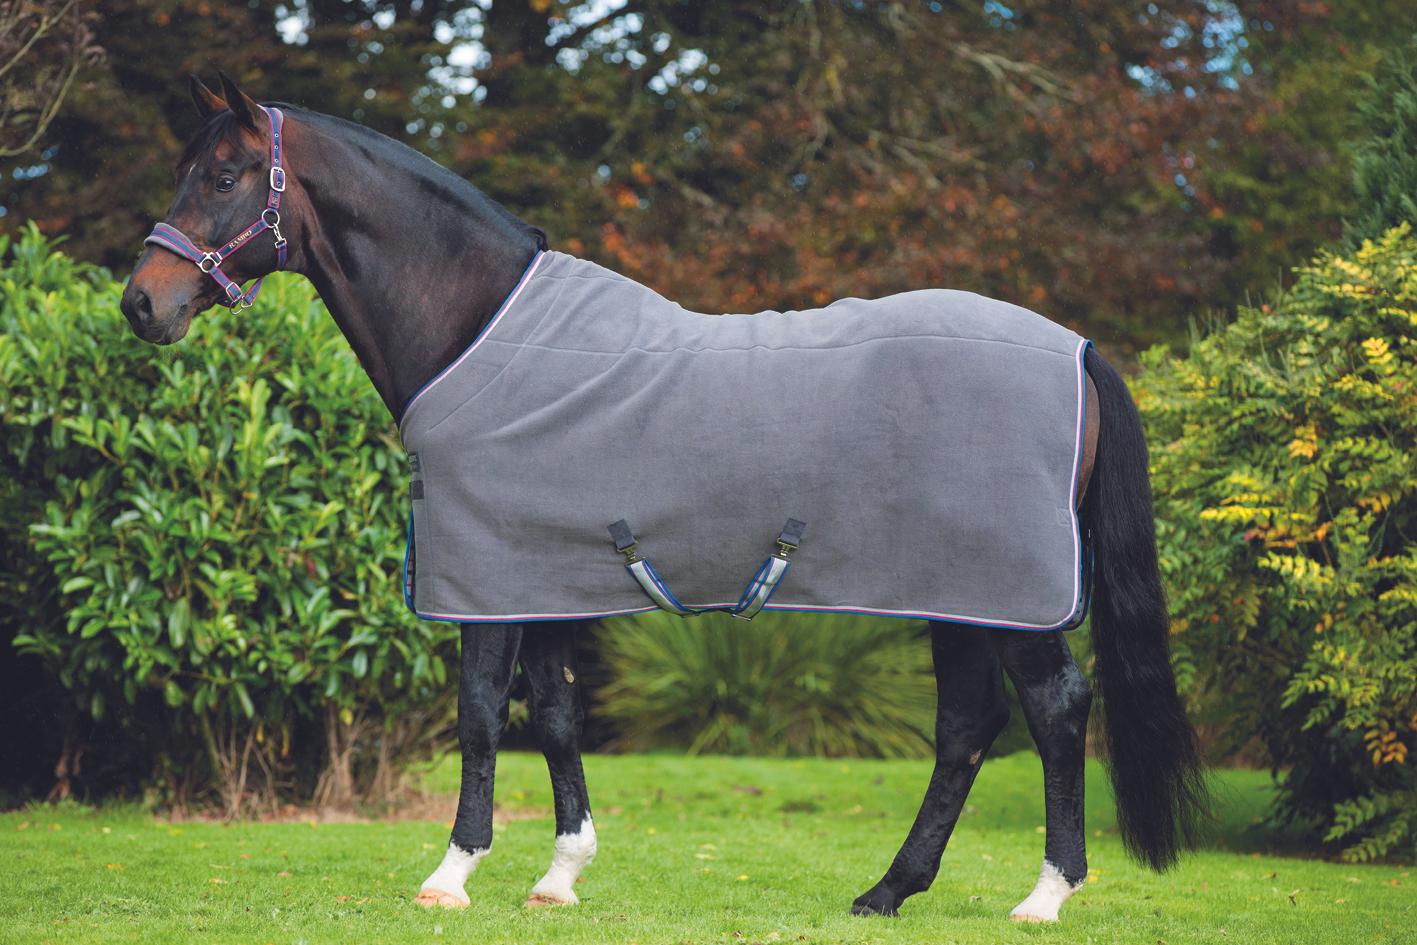 Horseware Horseware Horseware Ireland Rambo Deluxe Fleece Stable Sheet Double Bonded Anti-Piling 49c4cd